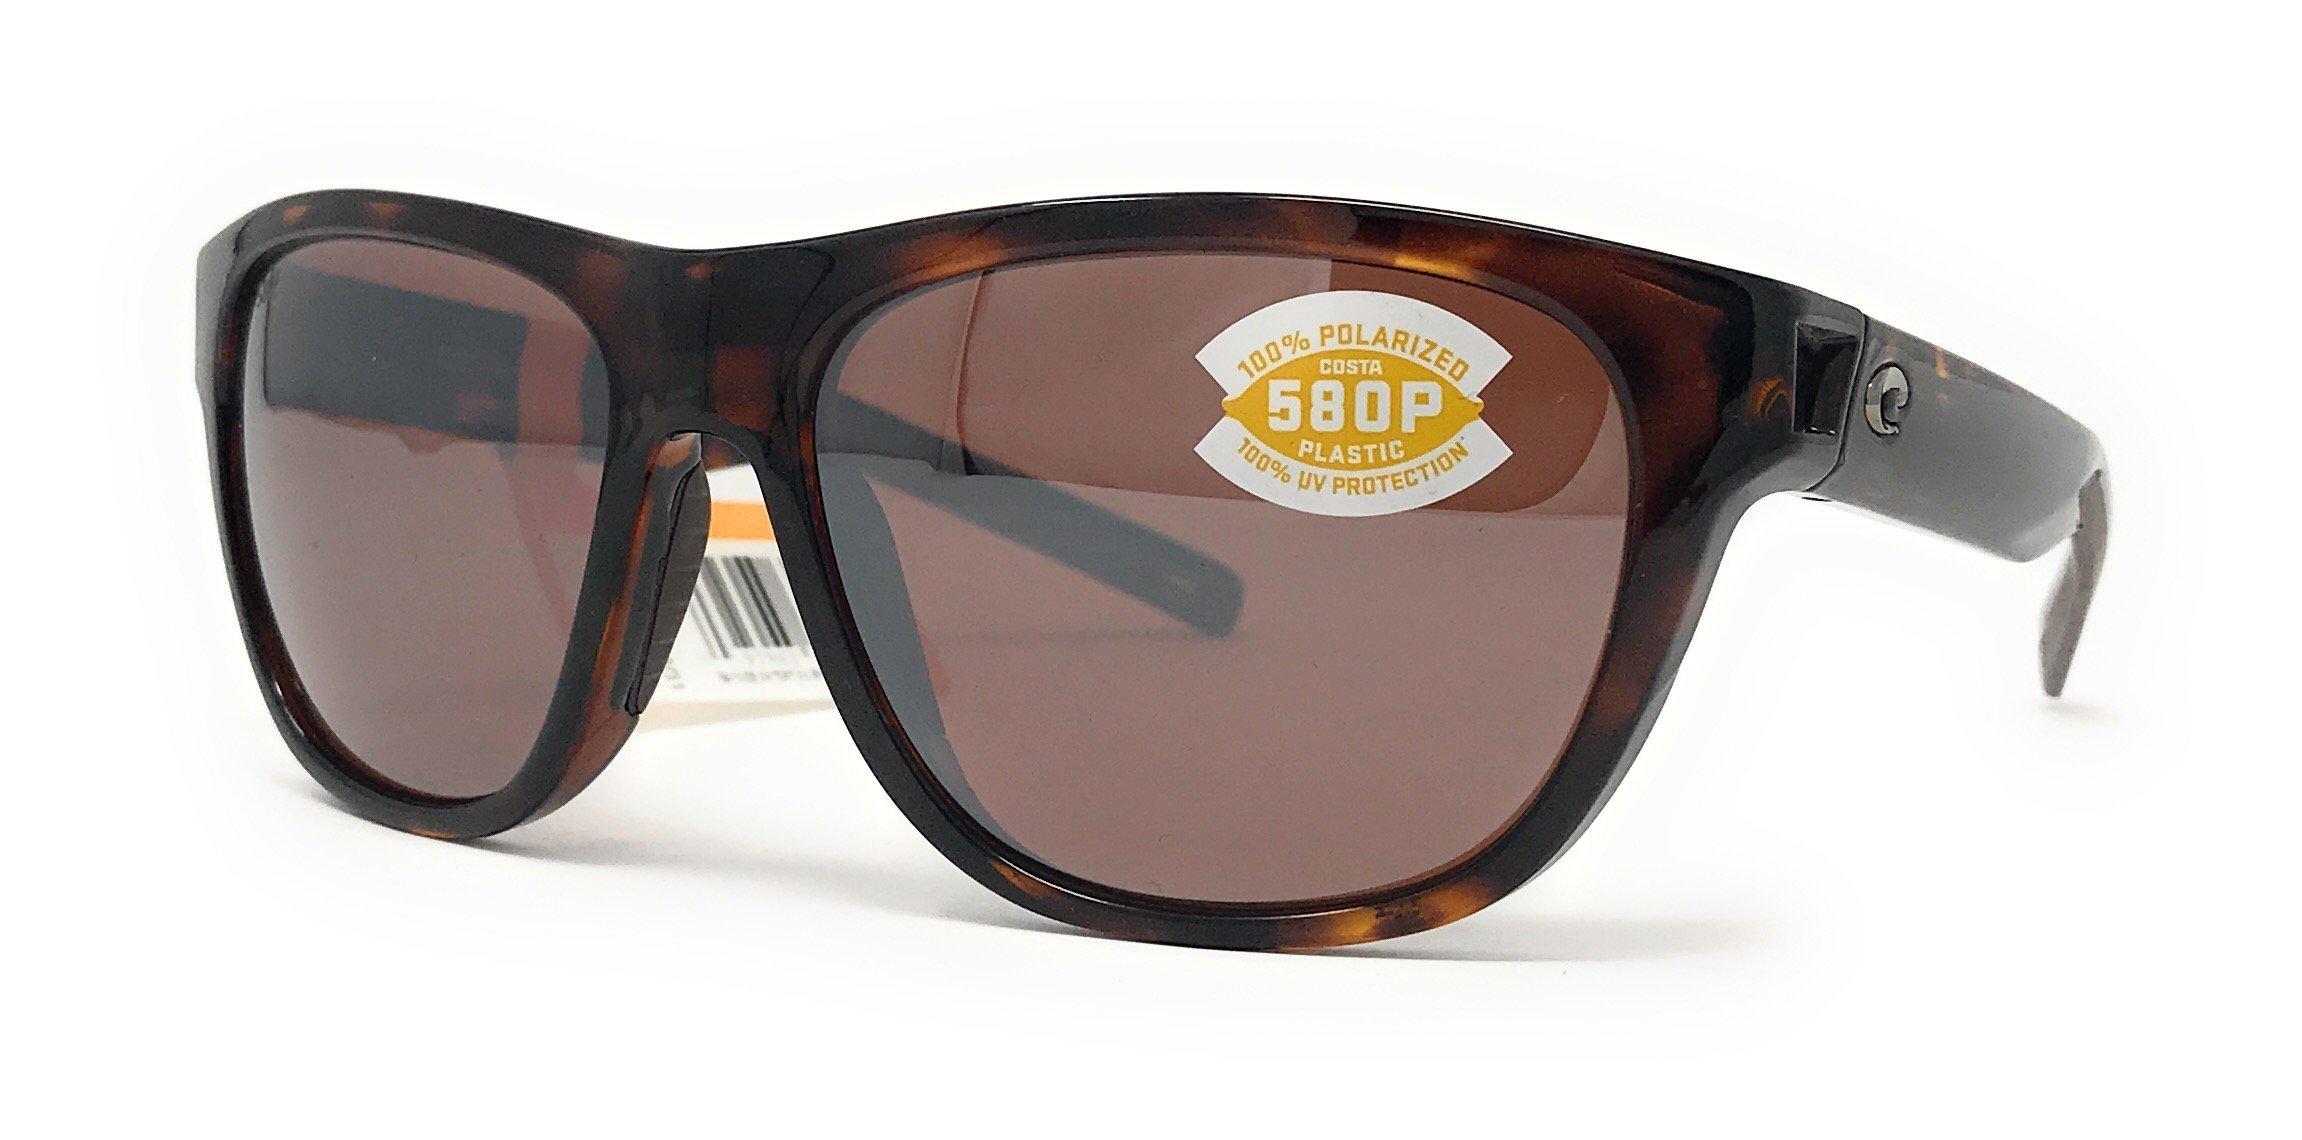 Bayside 580P Sunglasses